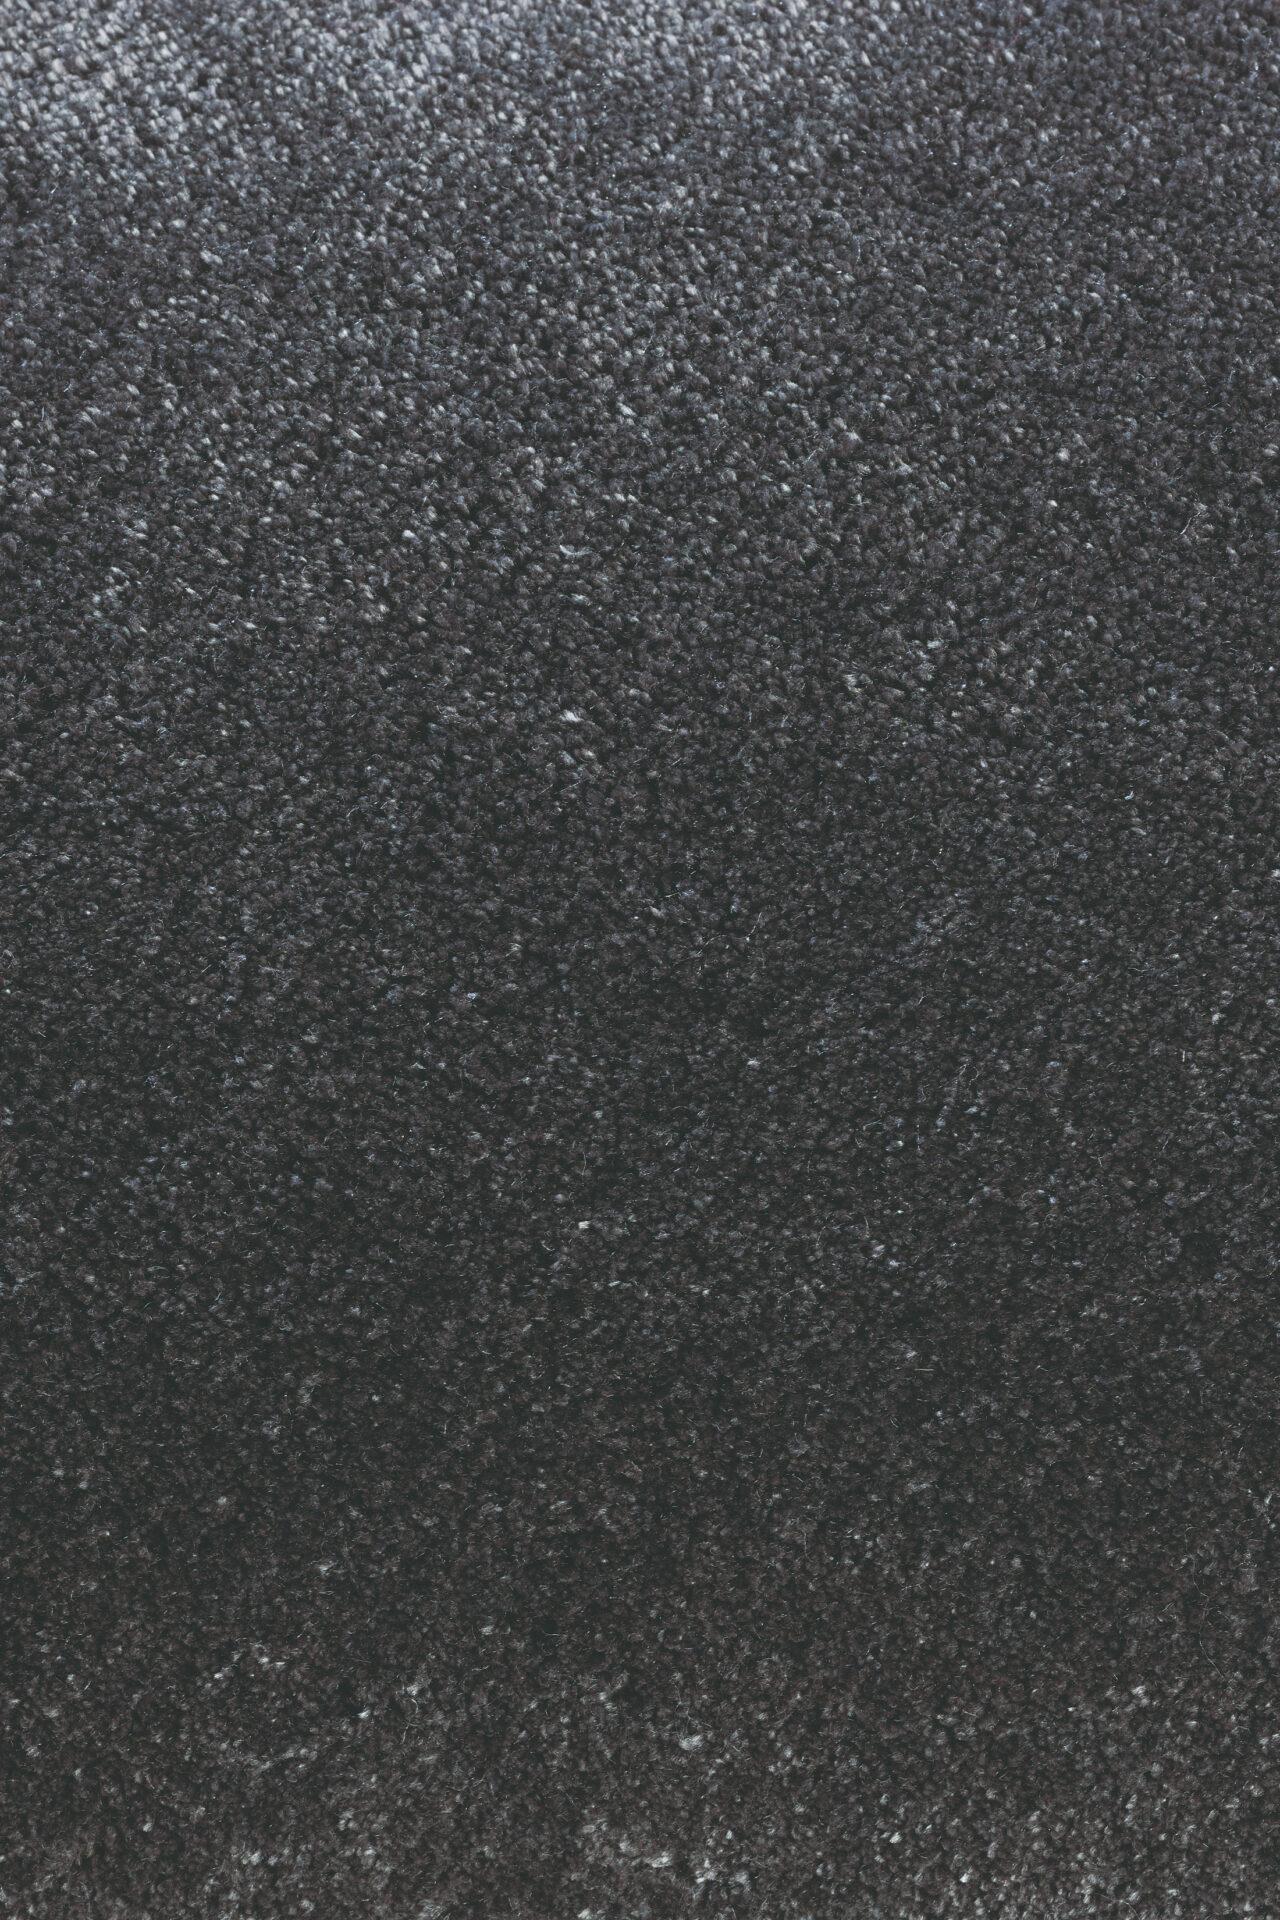 czarny dywan gladki Twinset Uni Cut Pile 21515